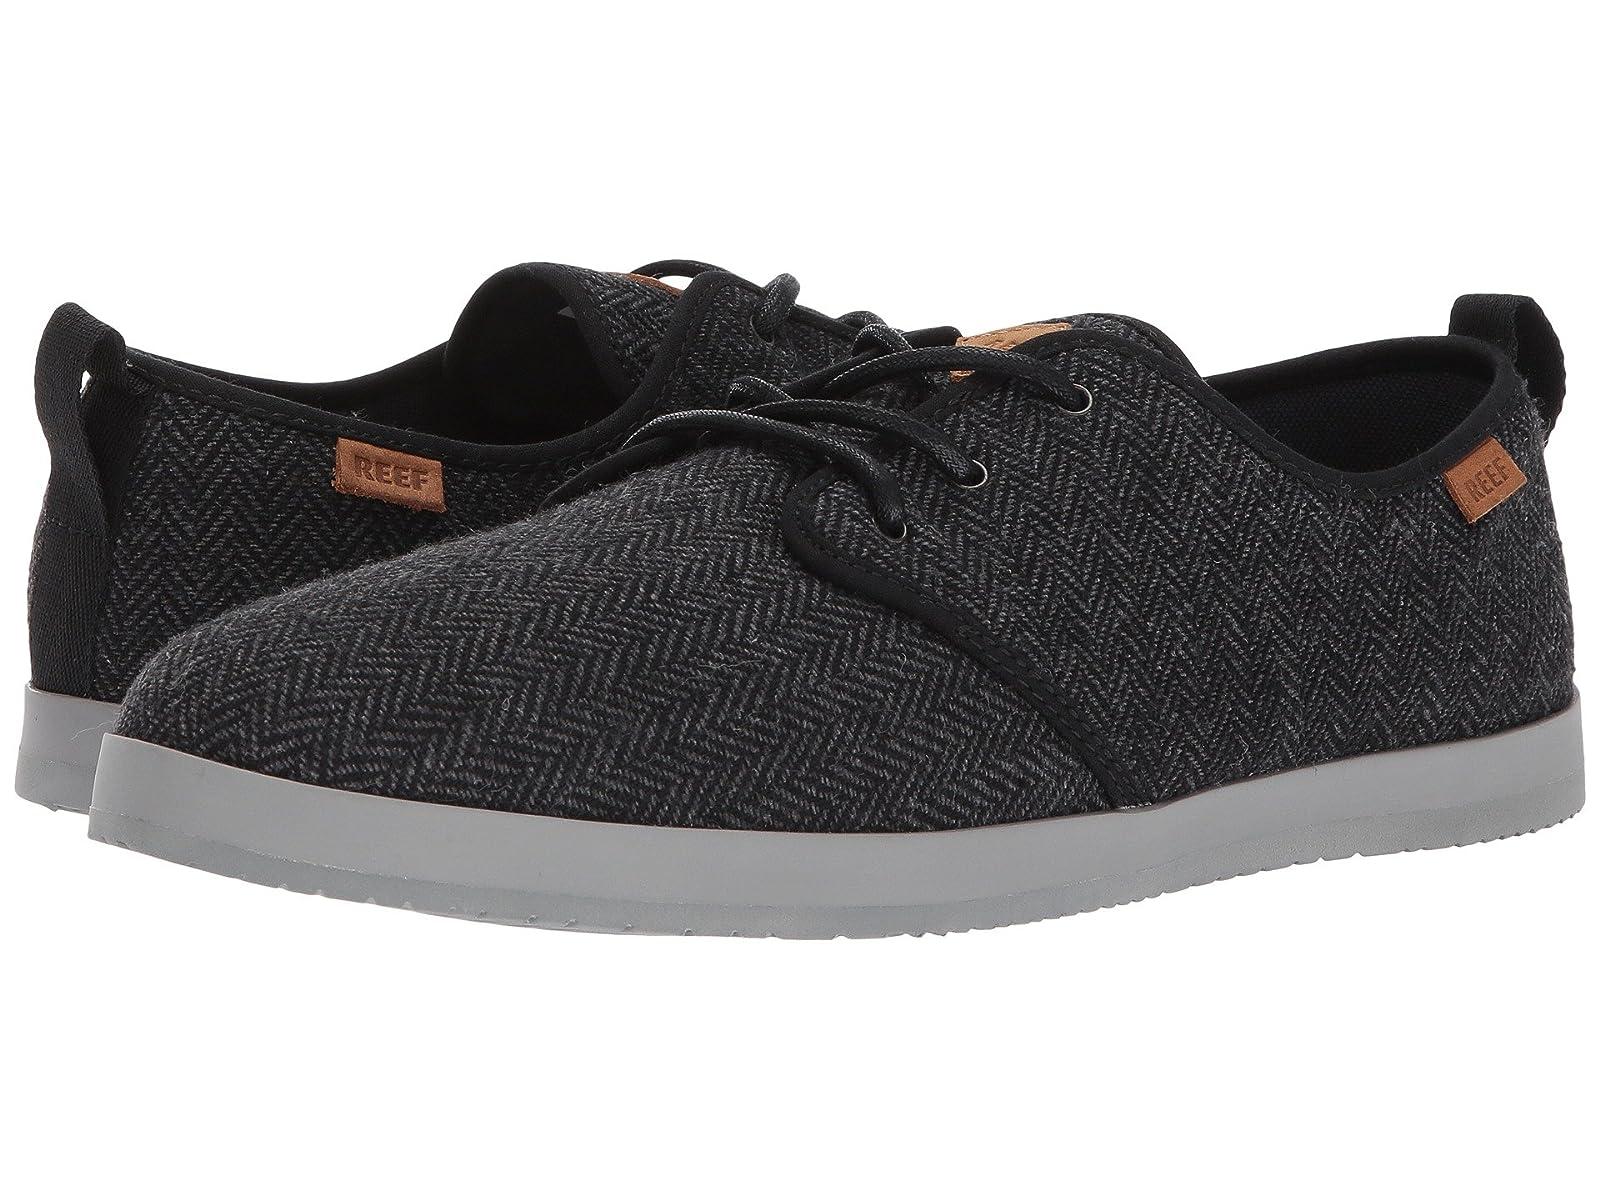 Reef Landis TXCheap and distinctive eye-catching shoes